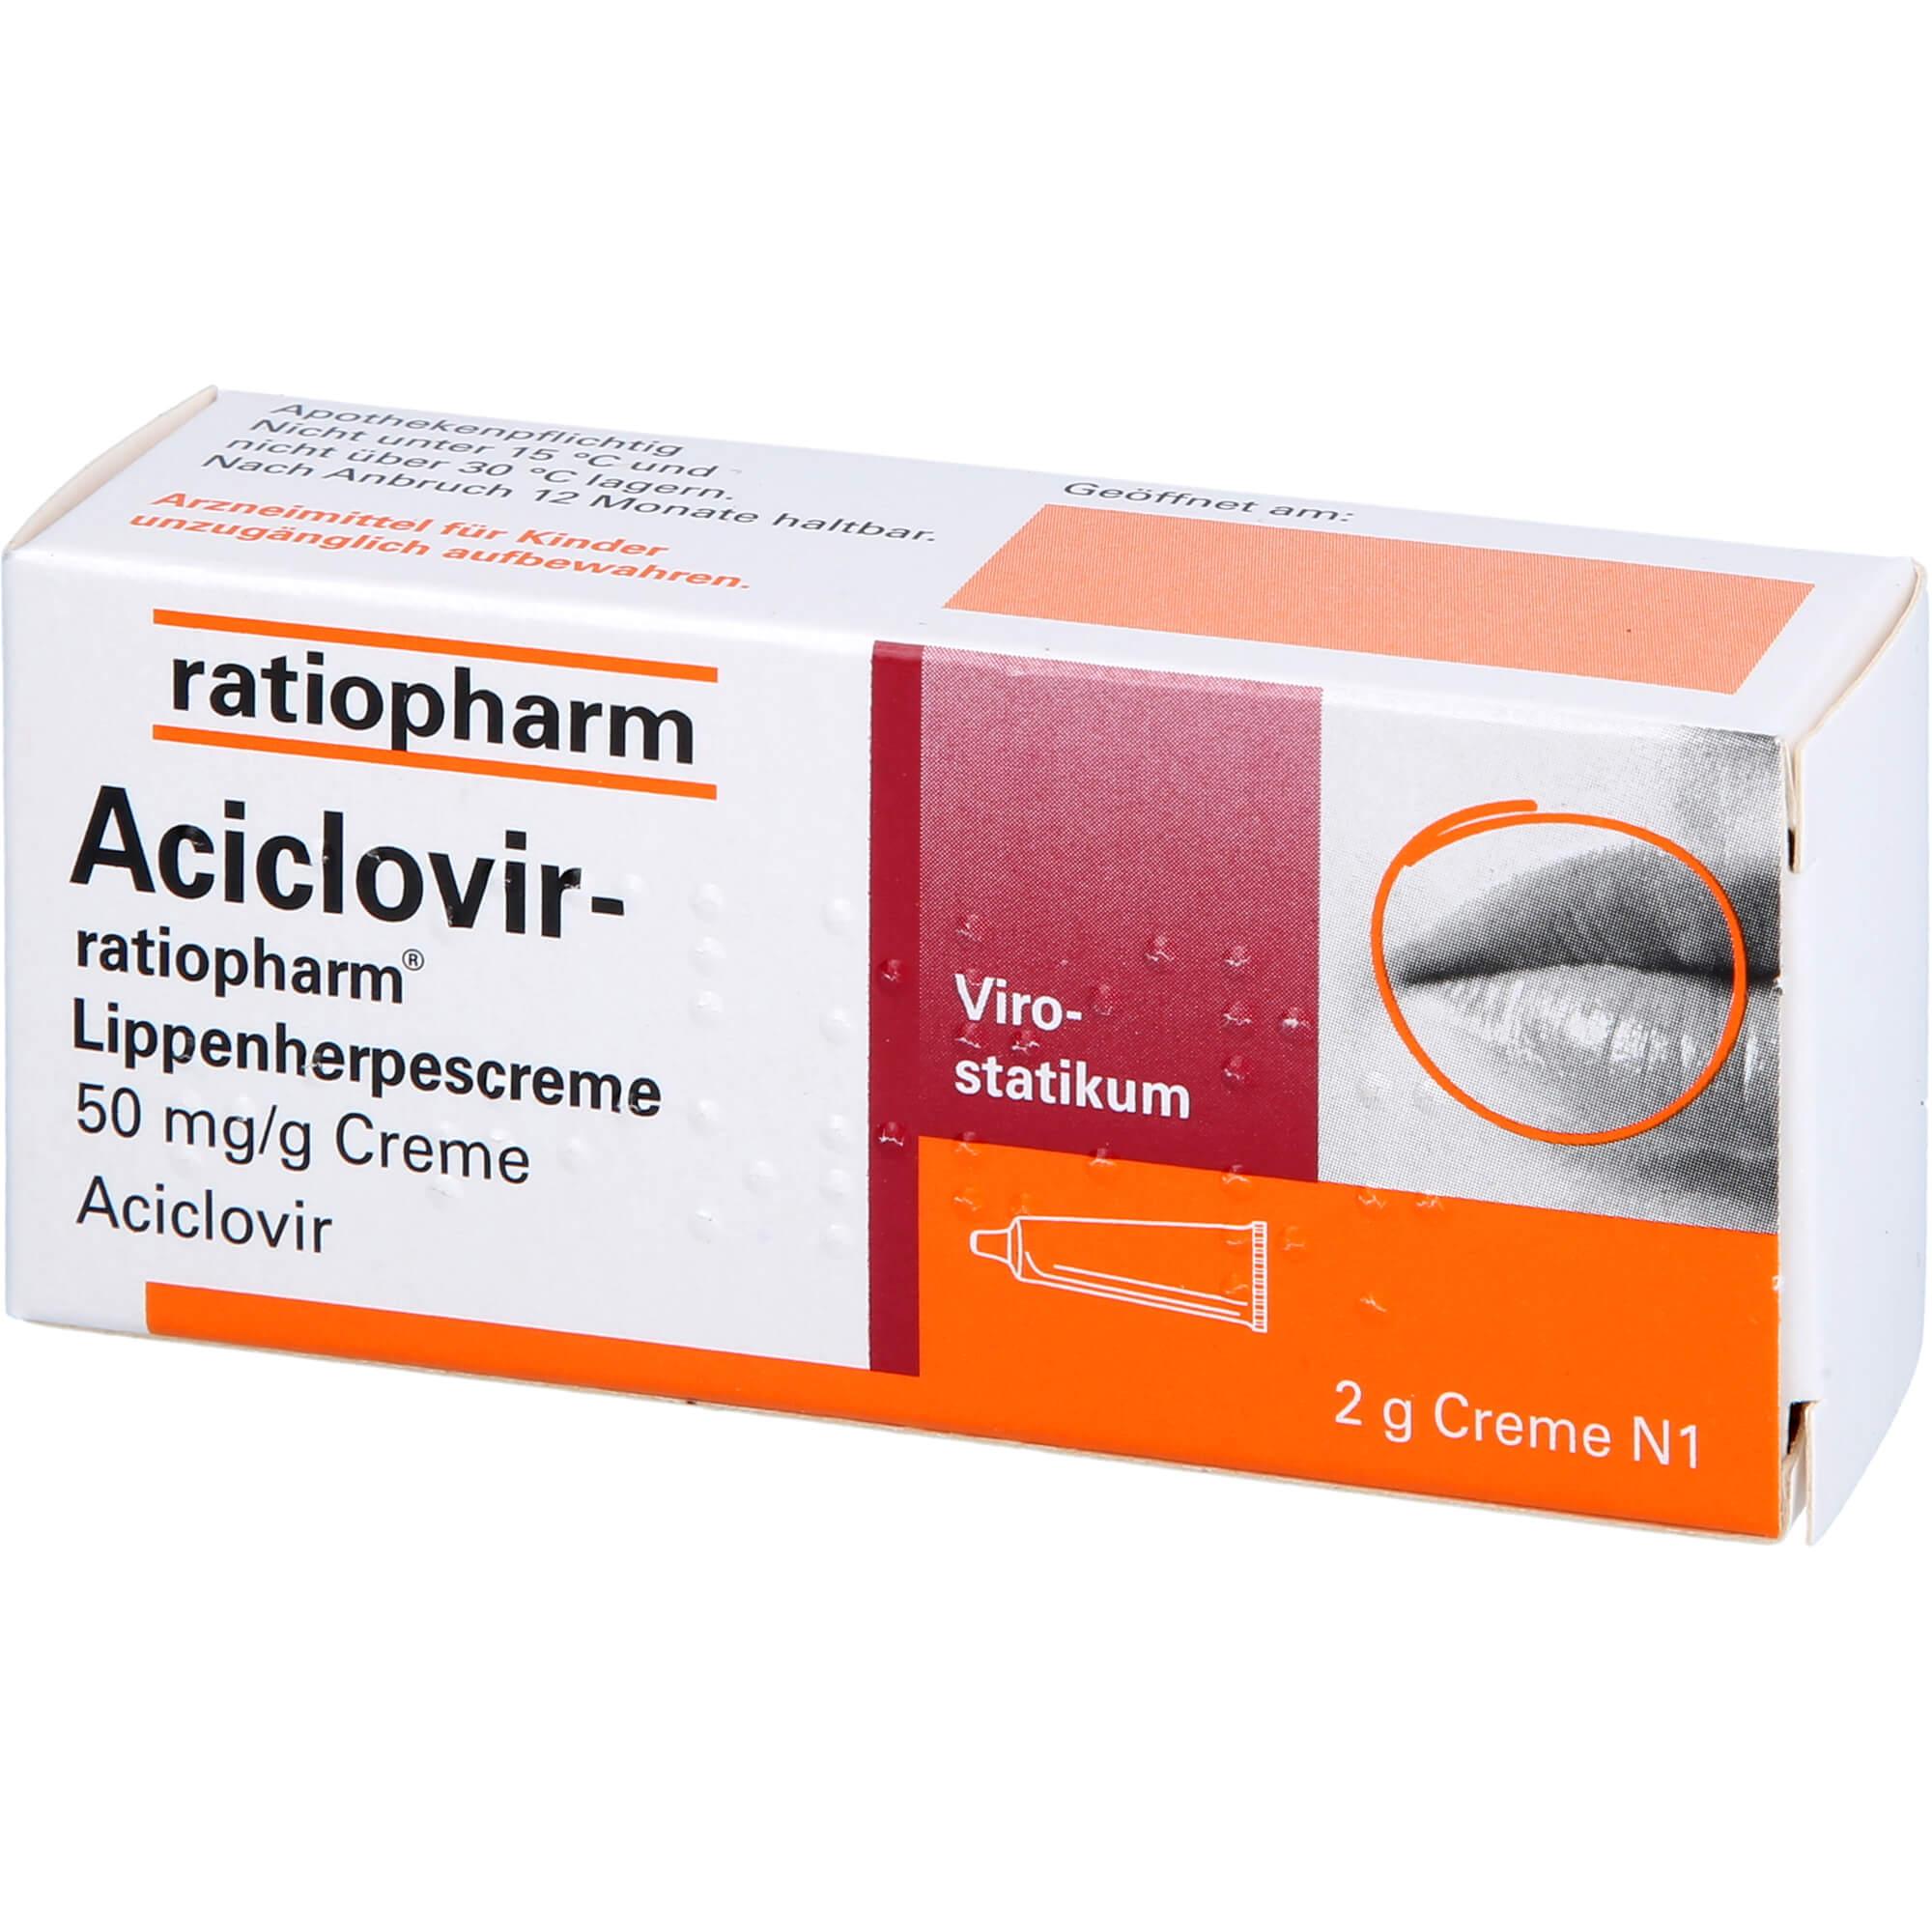 ACICLOVIR-ratiopharm-Lippenherpescreme